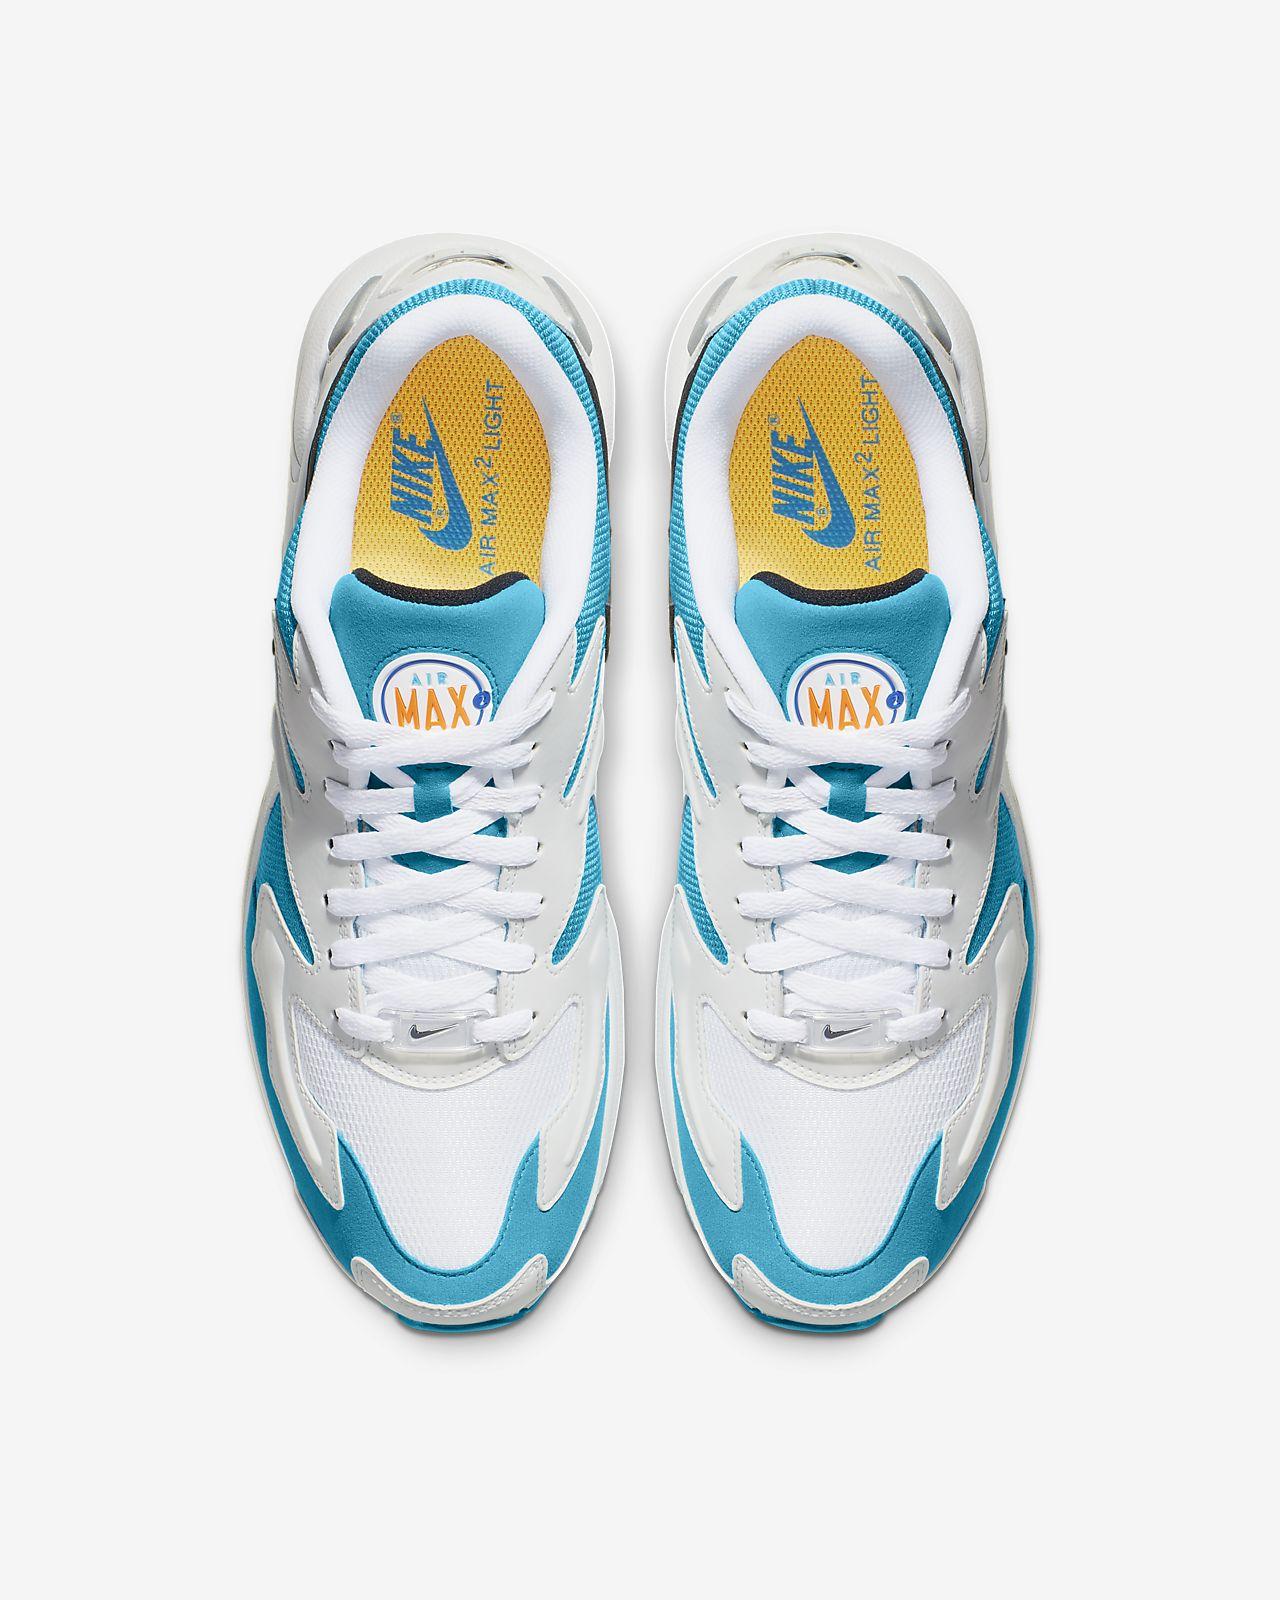 Nike M ndDk Air Til Light Sko Max2 vyw8NOm0n